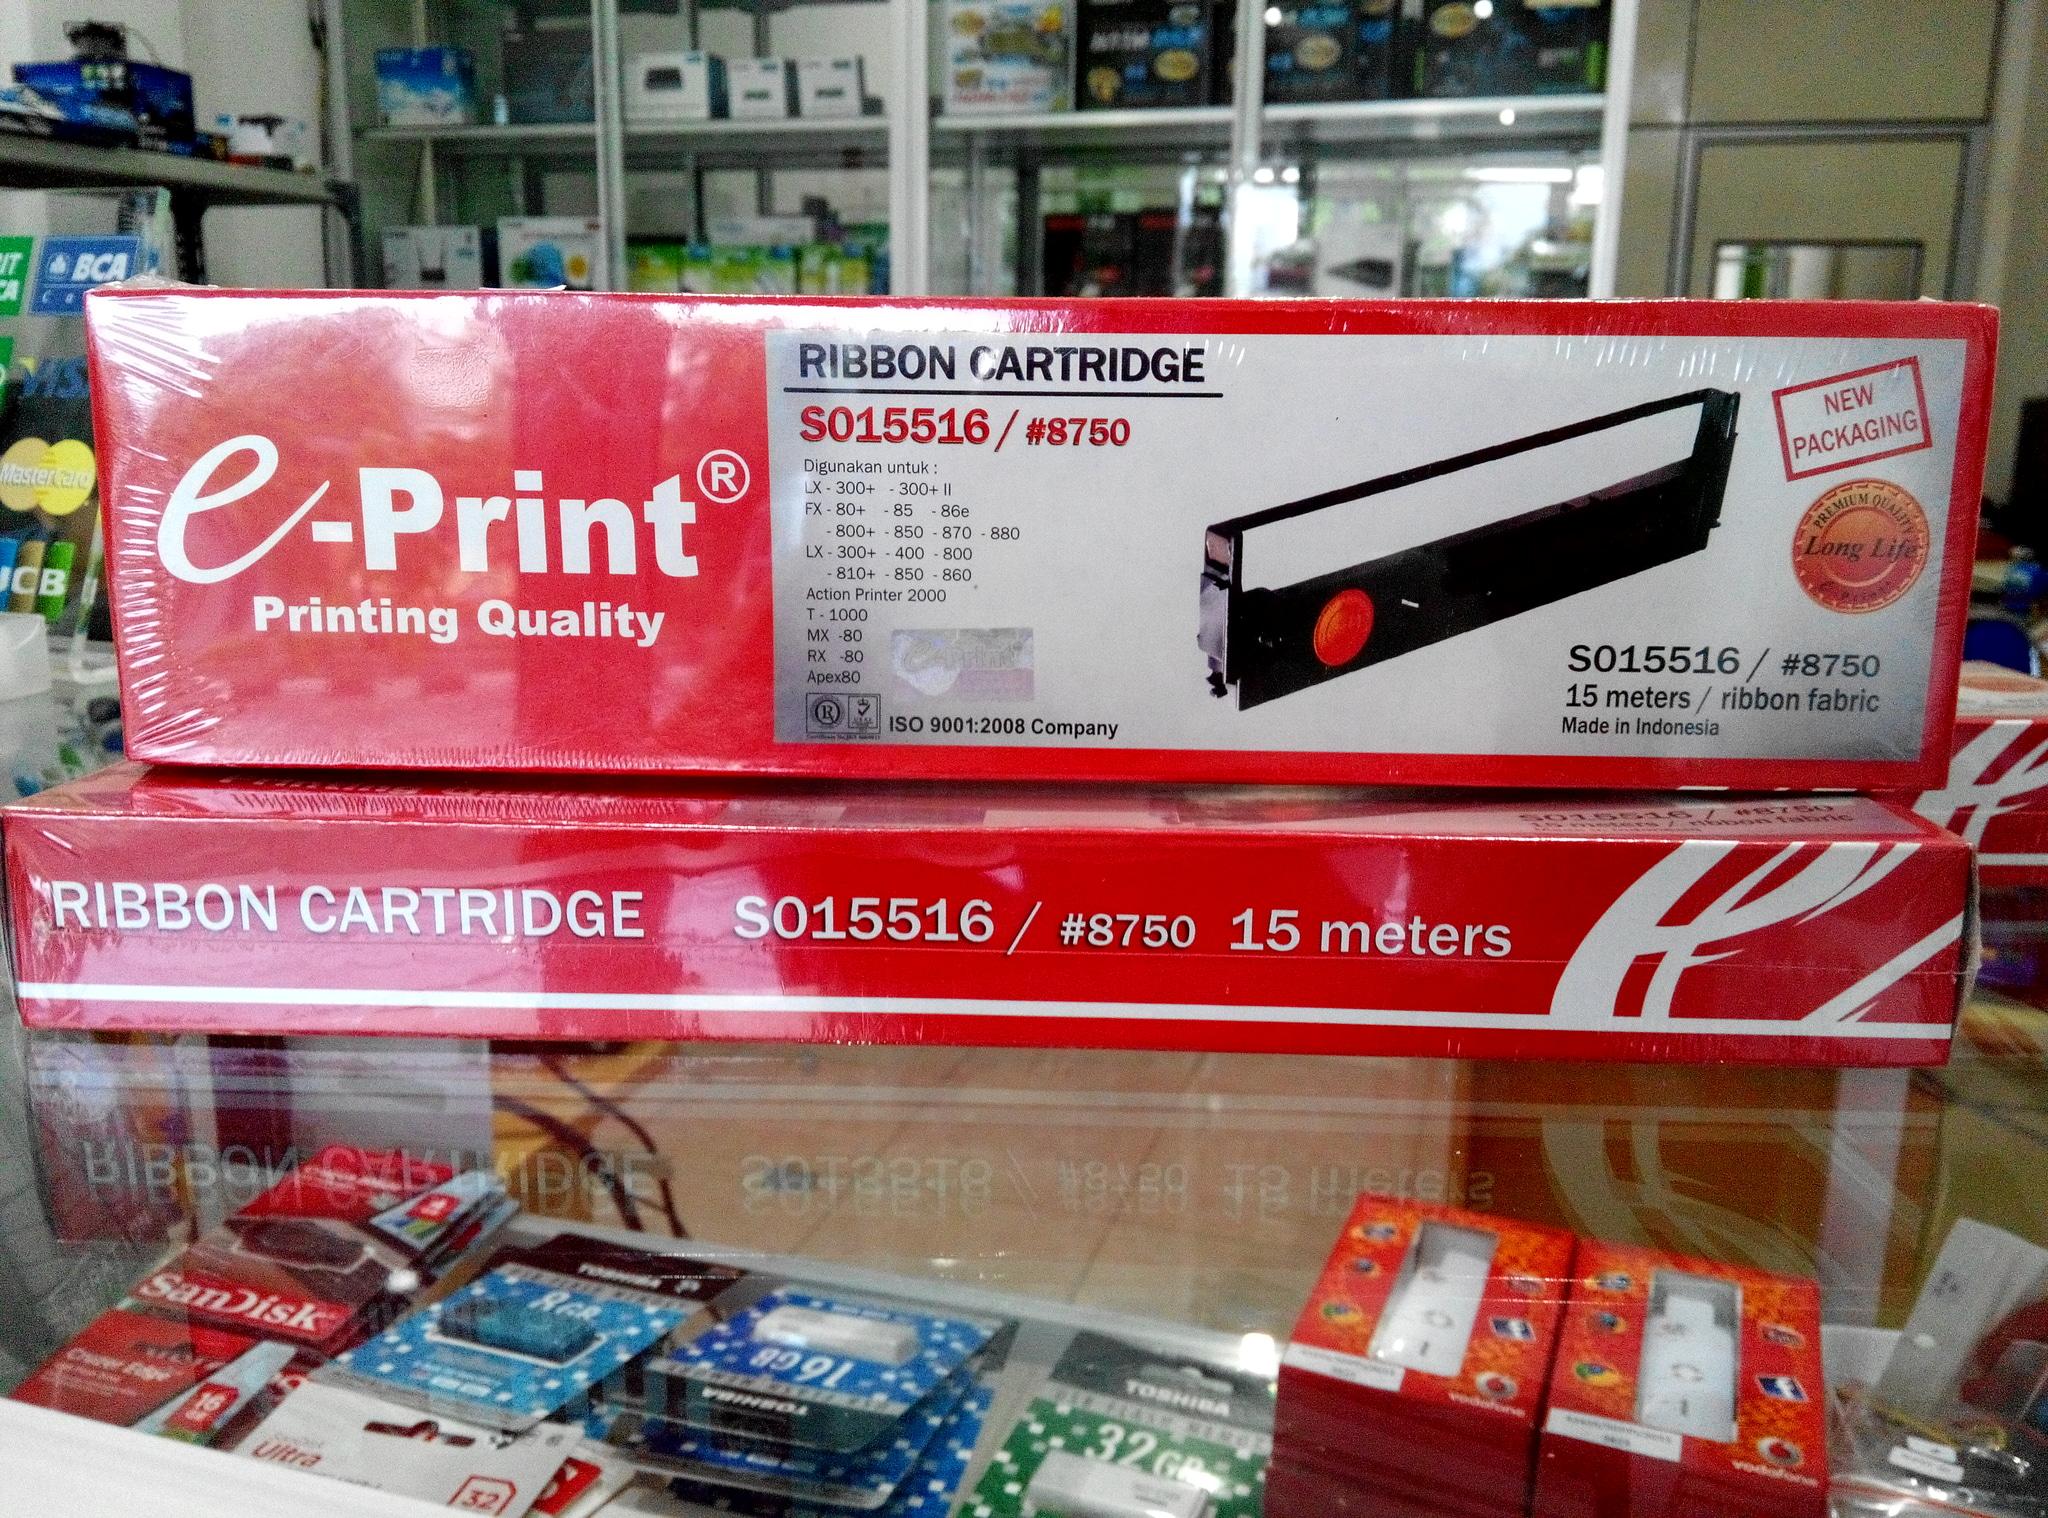 Jual Murah Pita Epson Lx 300 Termurah 2018 Coco Loops 330g Free Pencil Case Kl33000 8852756304503pc 1 Ribbon Cartridge Lx300 Ii Dan Rumah E Print Prologic Computer Di